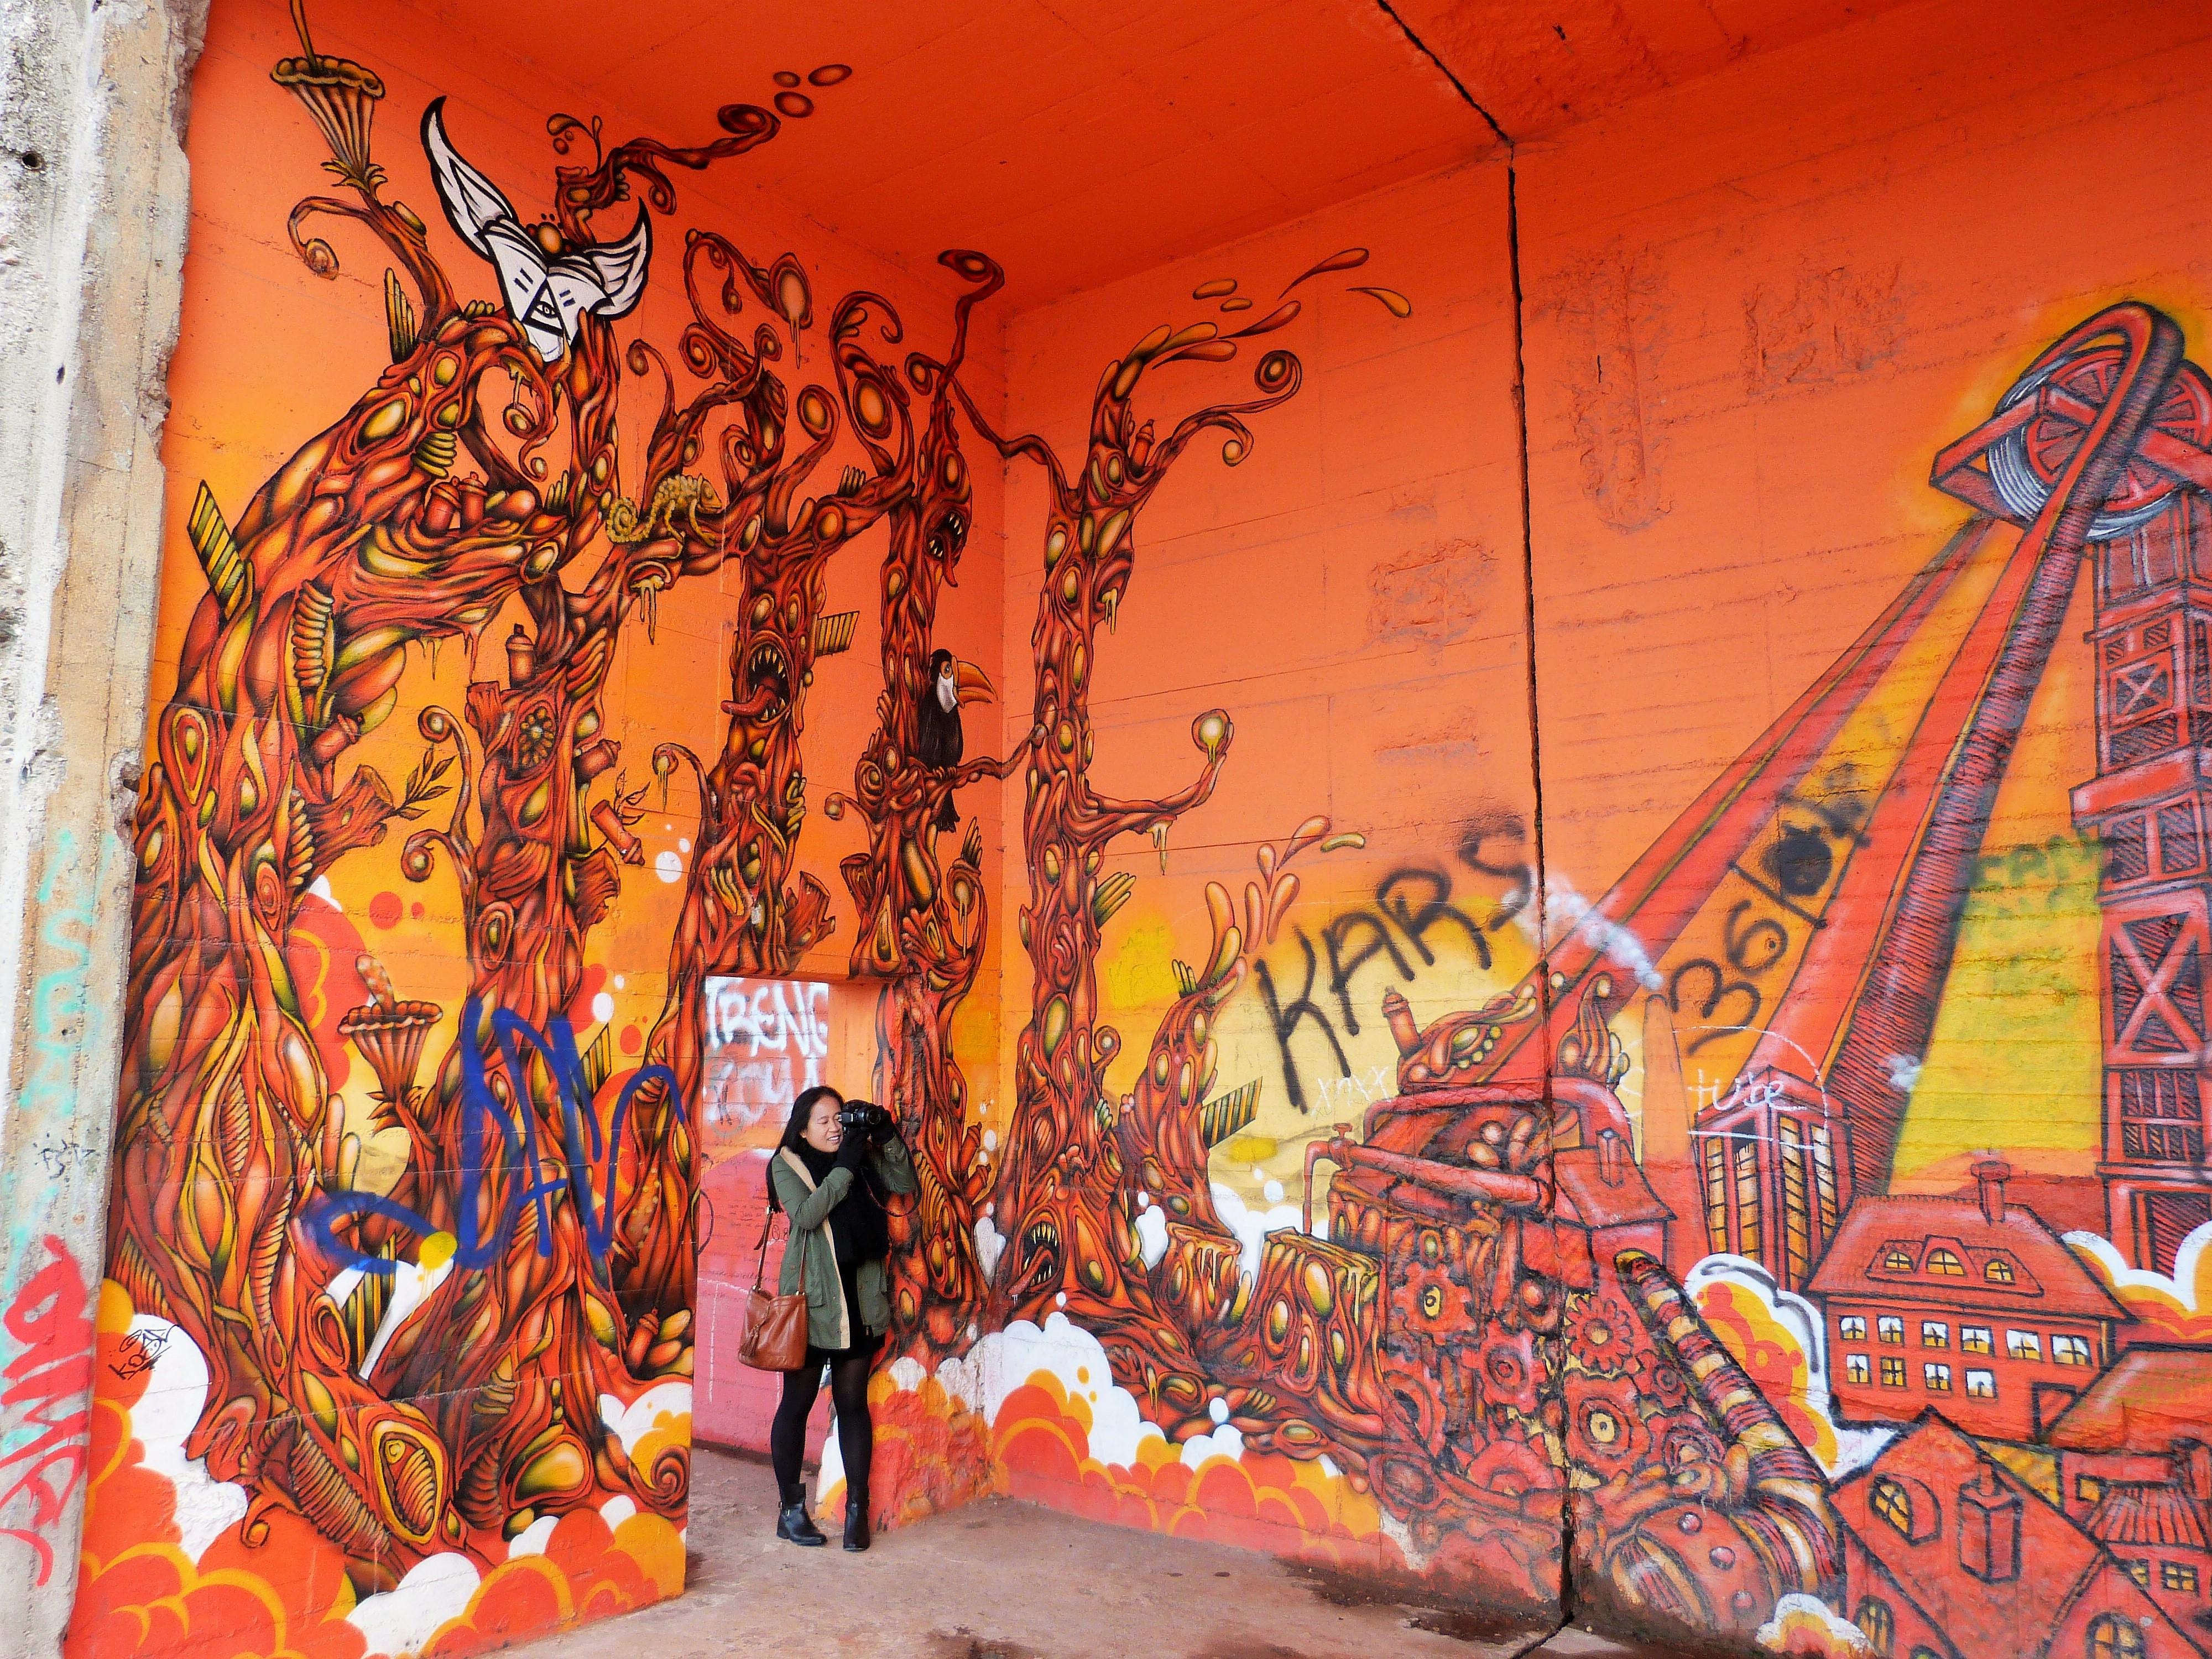 Graffiti Duisburg rheinpark graffiti duisburg 3 continental breakfast travel